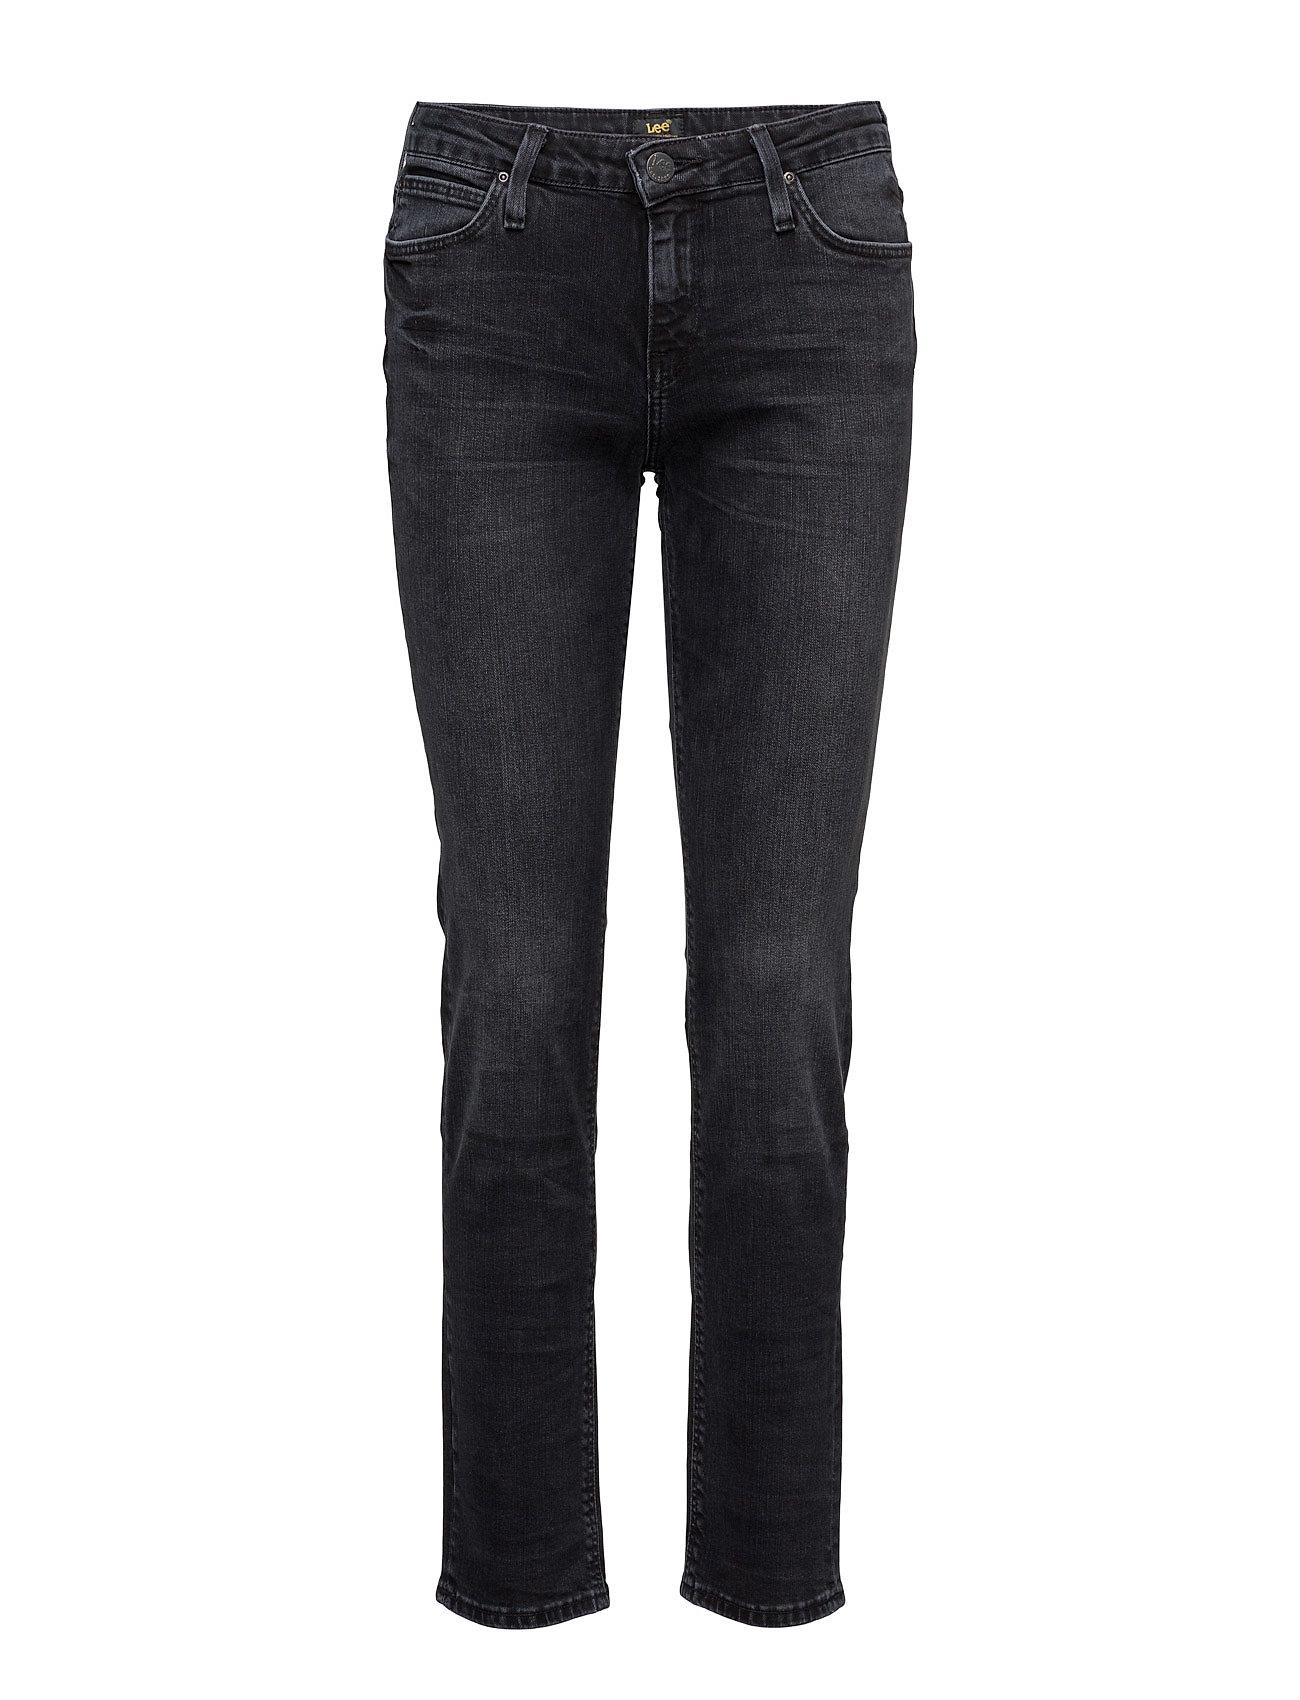 Elly Dark Raven Lee Jeans Bukser til Damer i